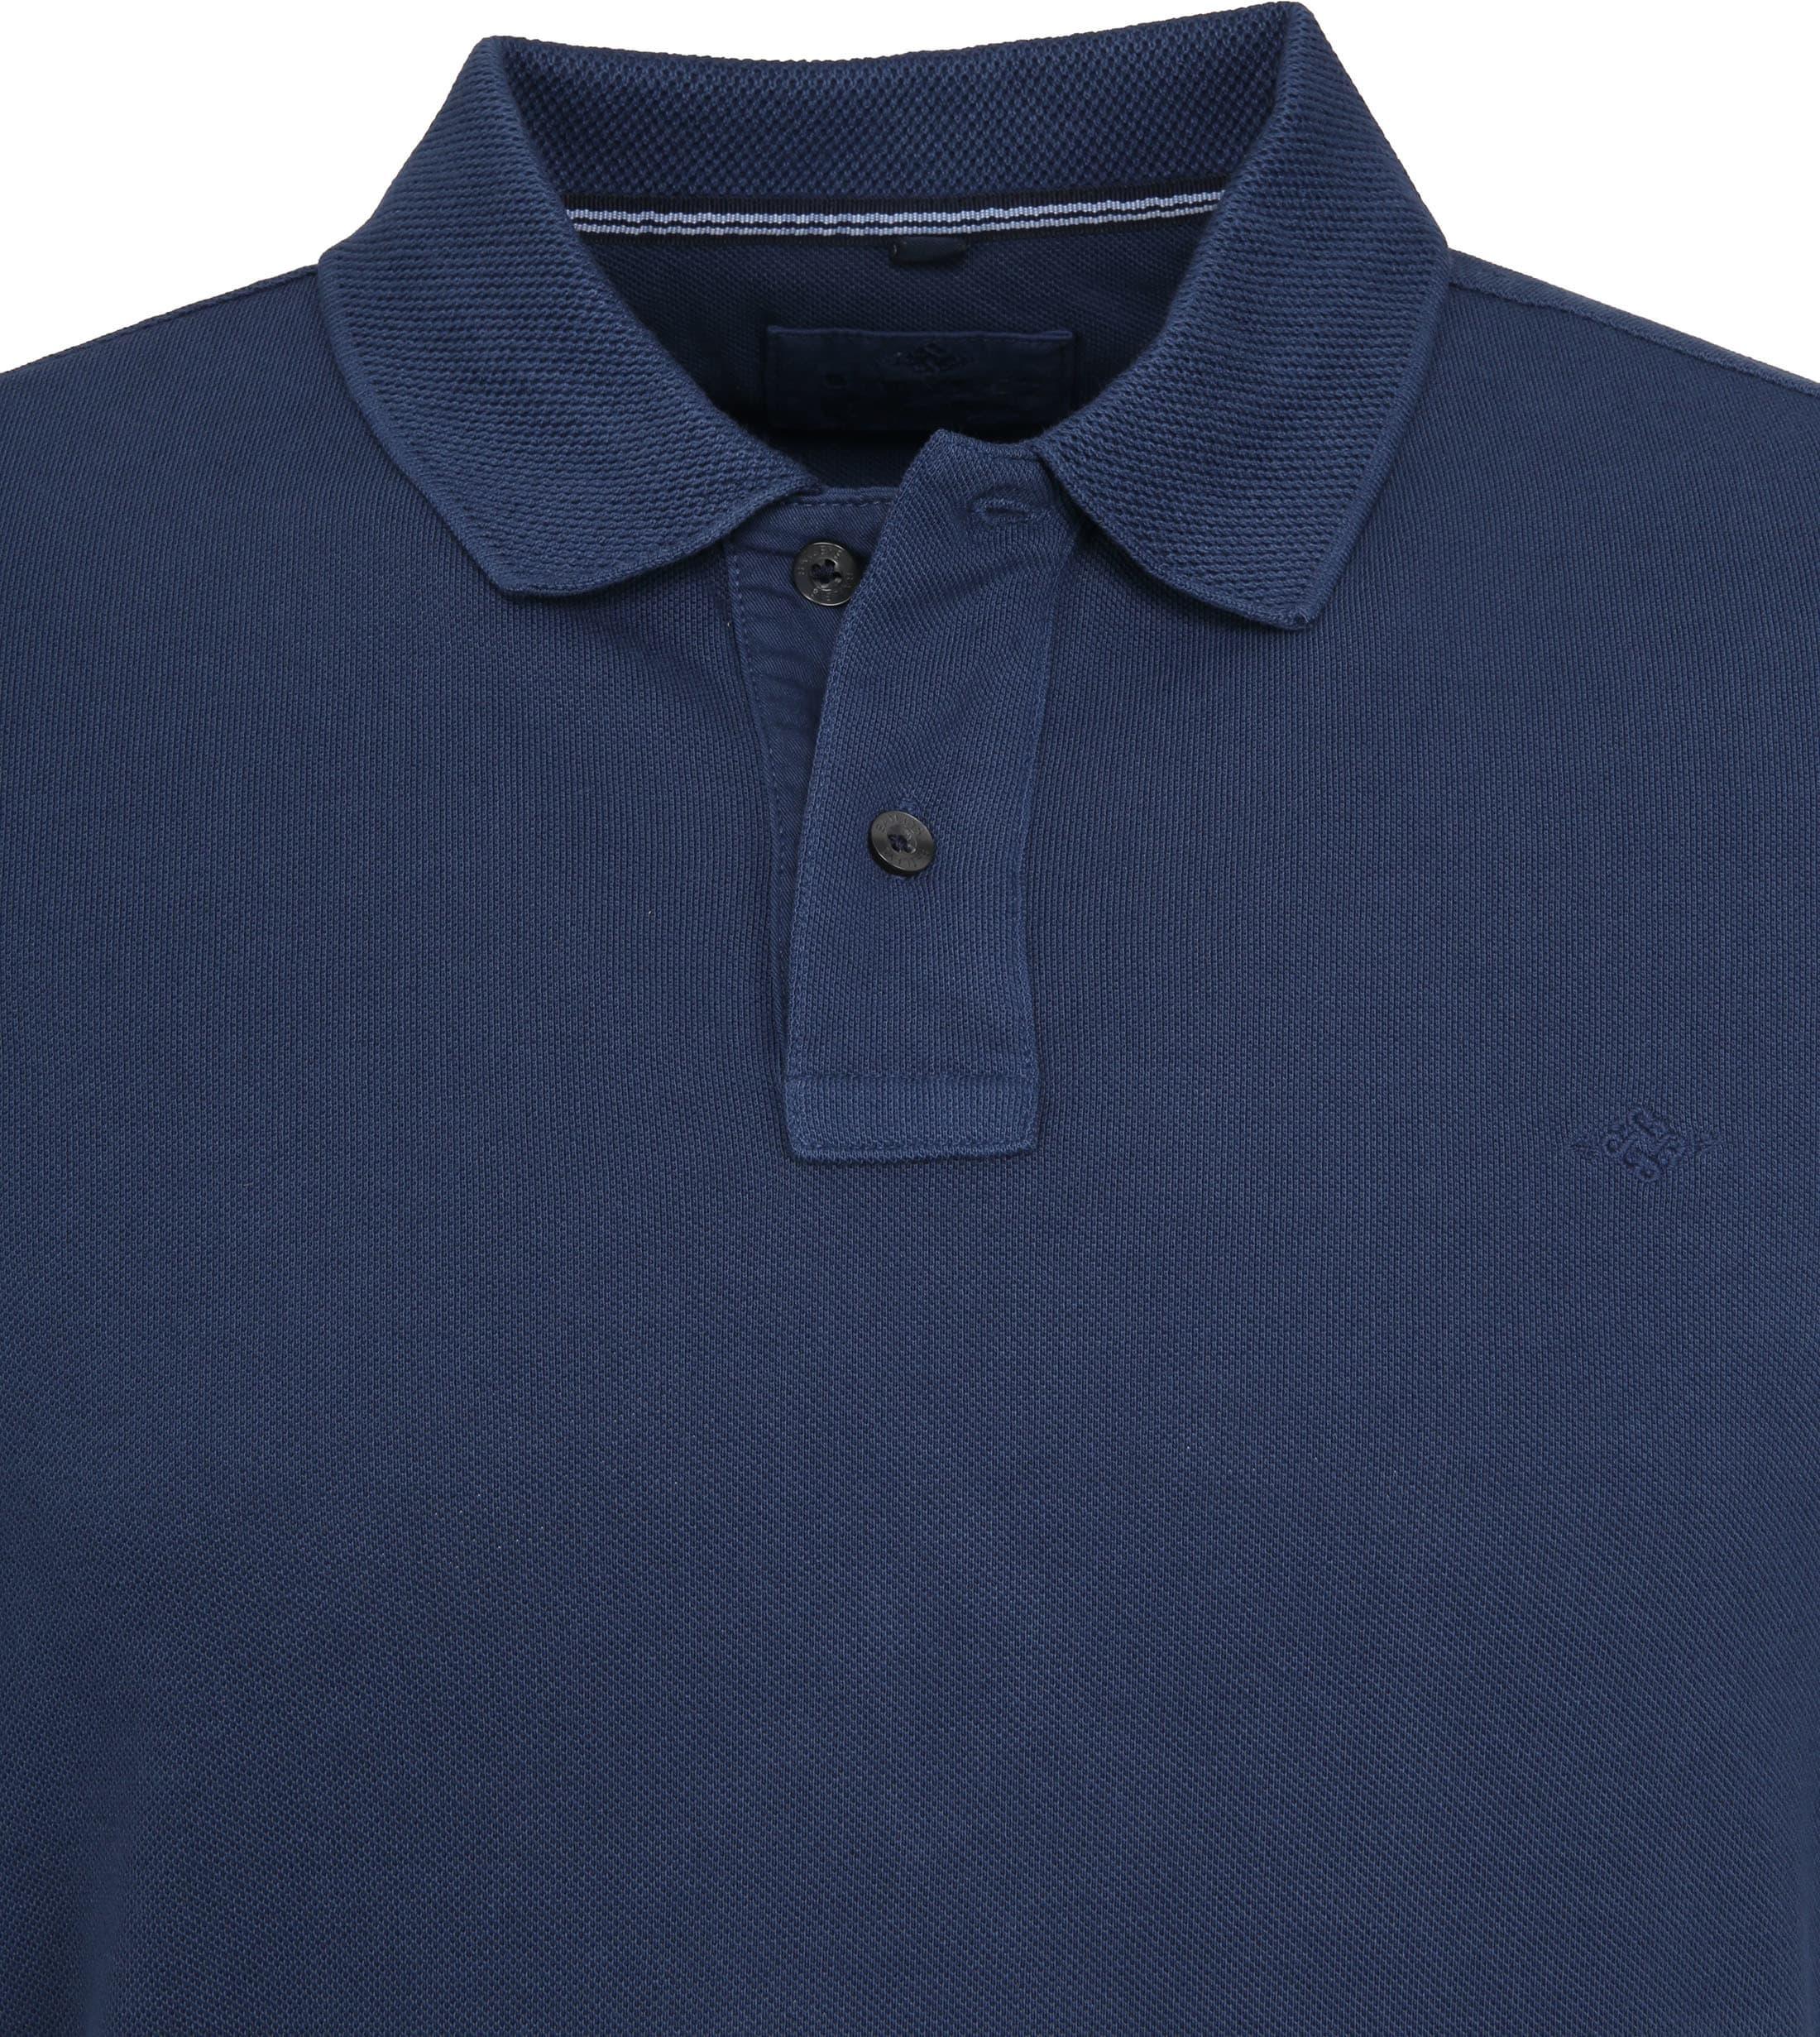 Suitable Vintage Poloshirt Navy foto 1